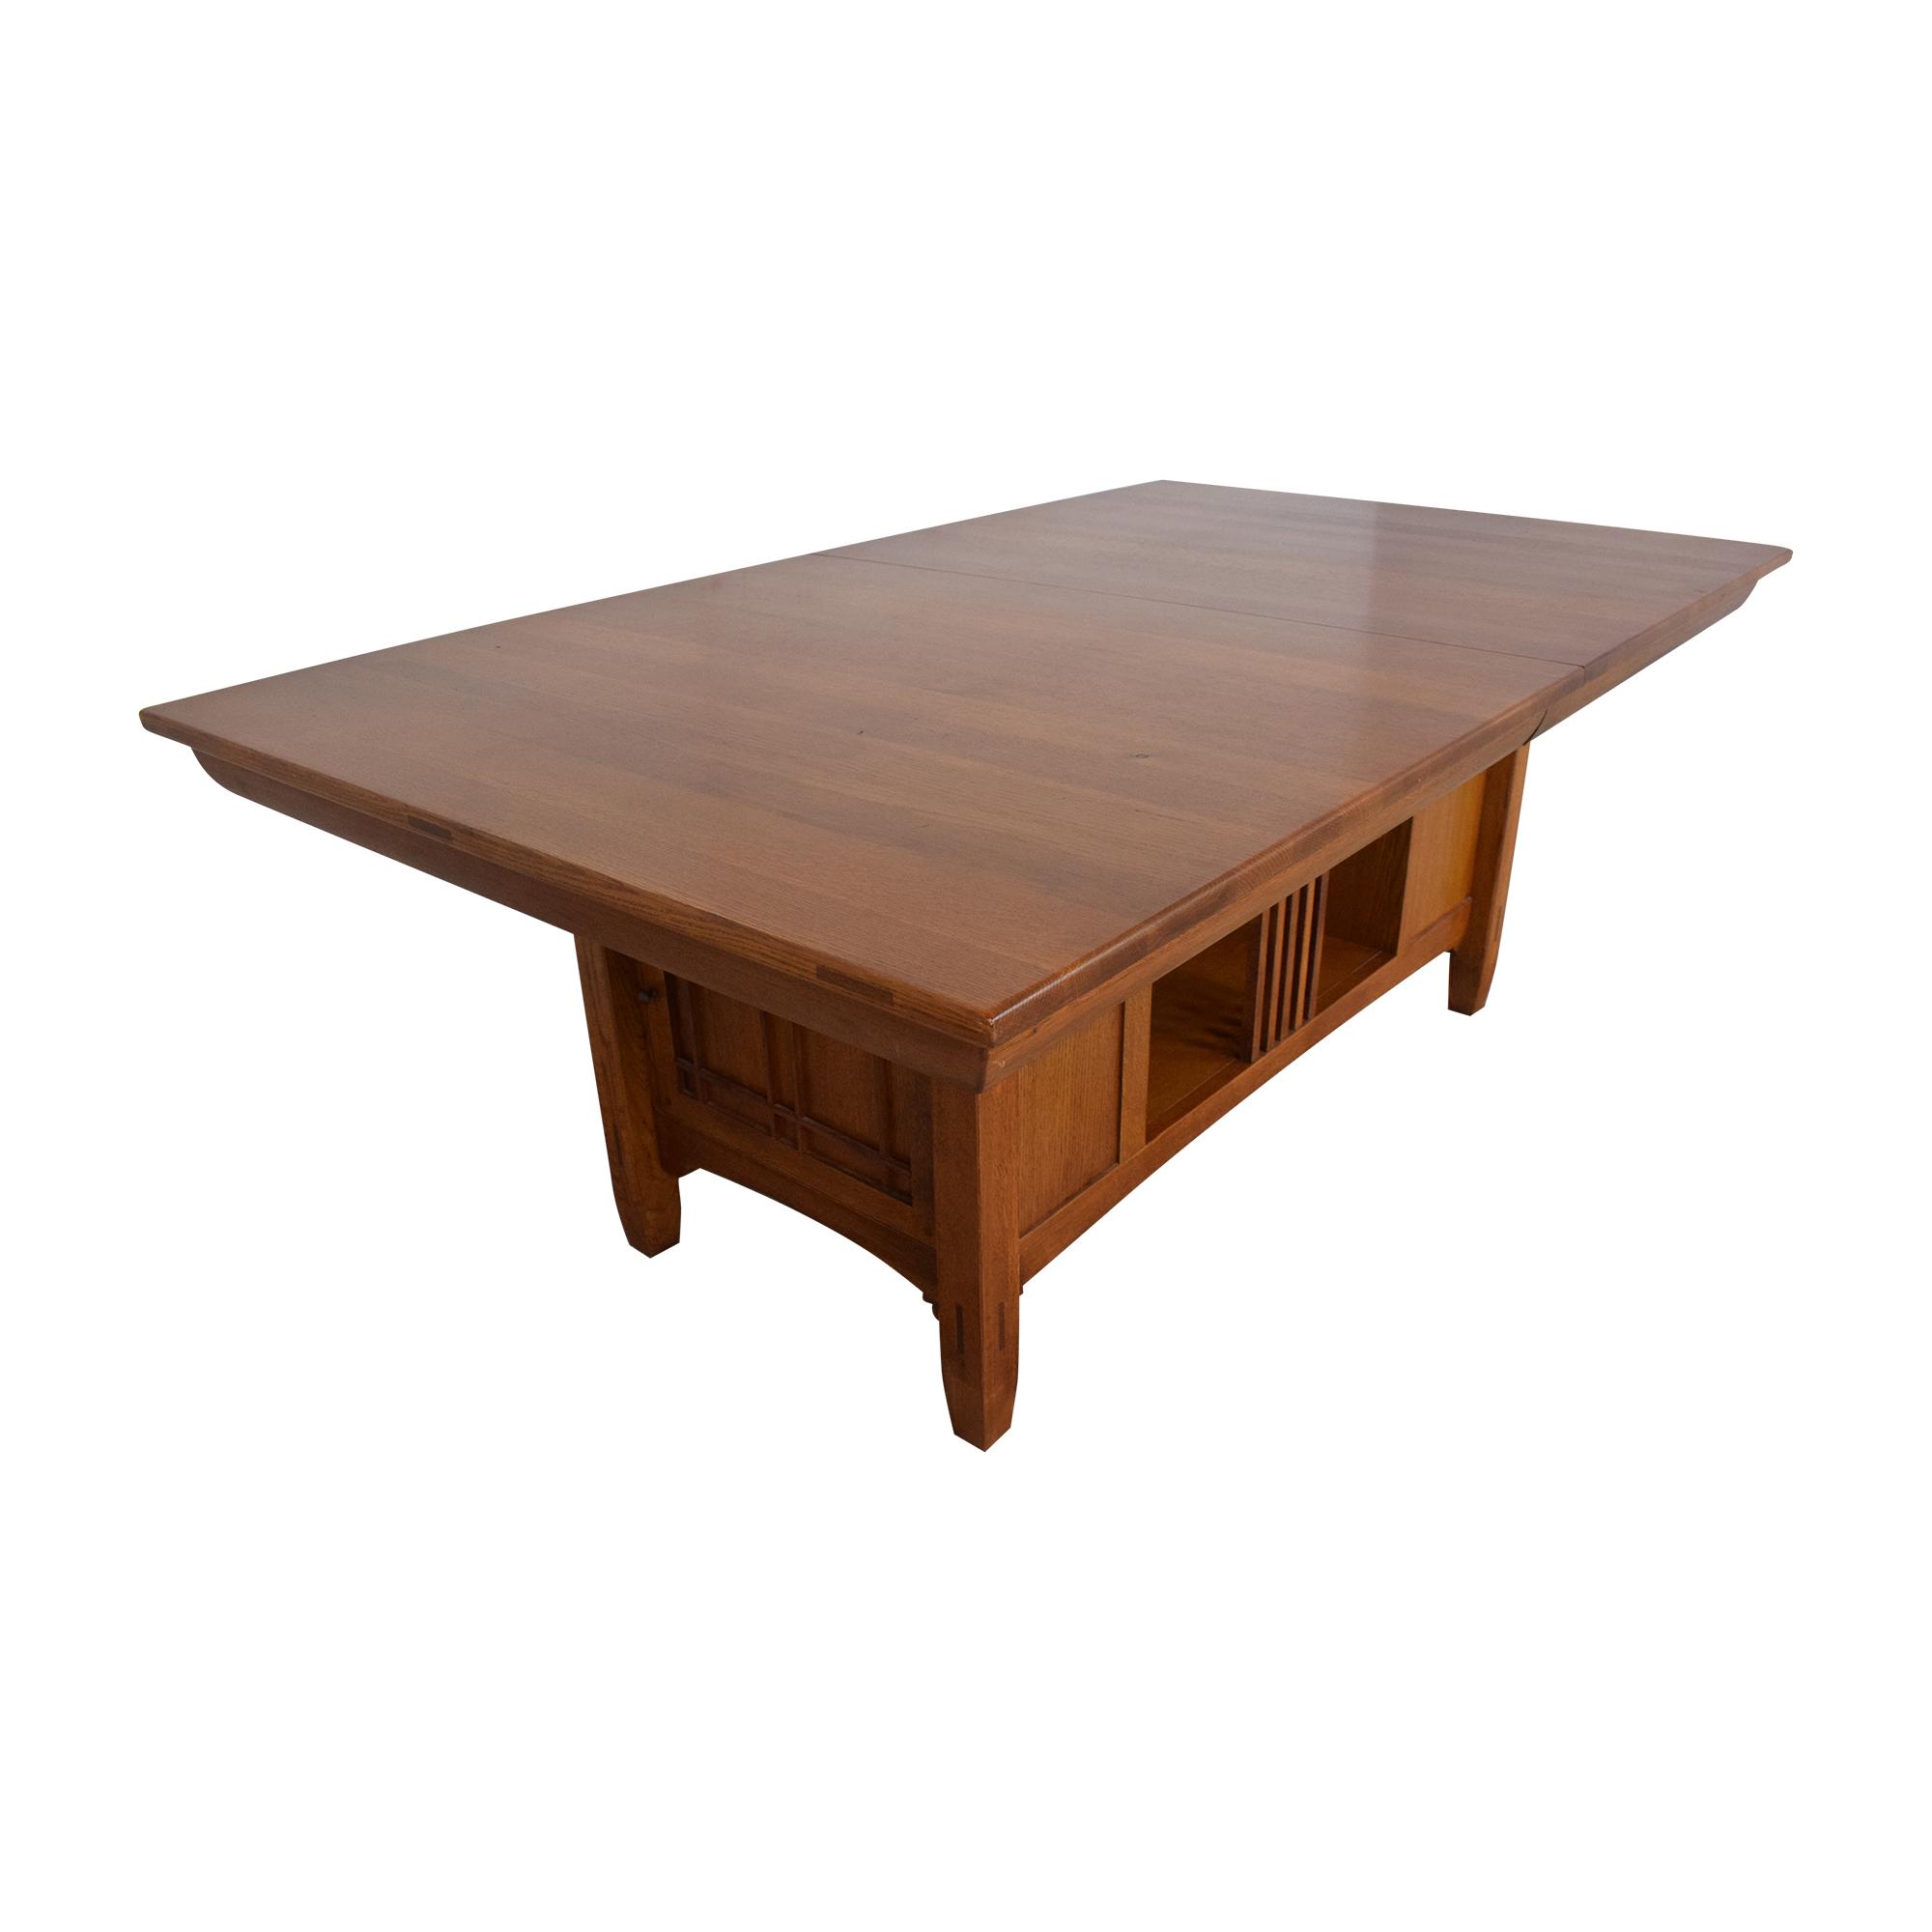 Lexington Furniture Lexington Bob Timberlake Arts & Crafts Collection Storage Dining Table ma